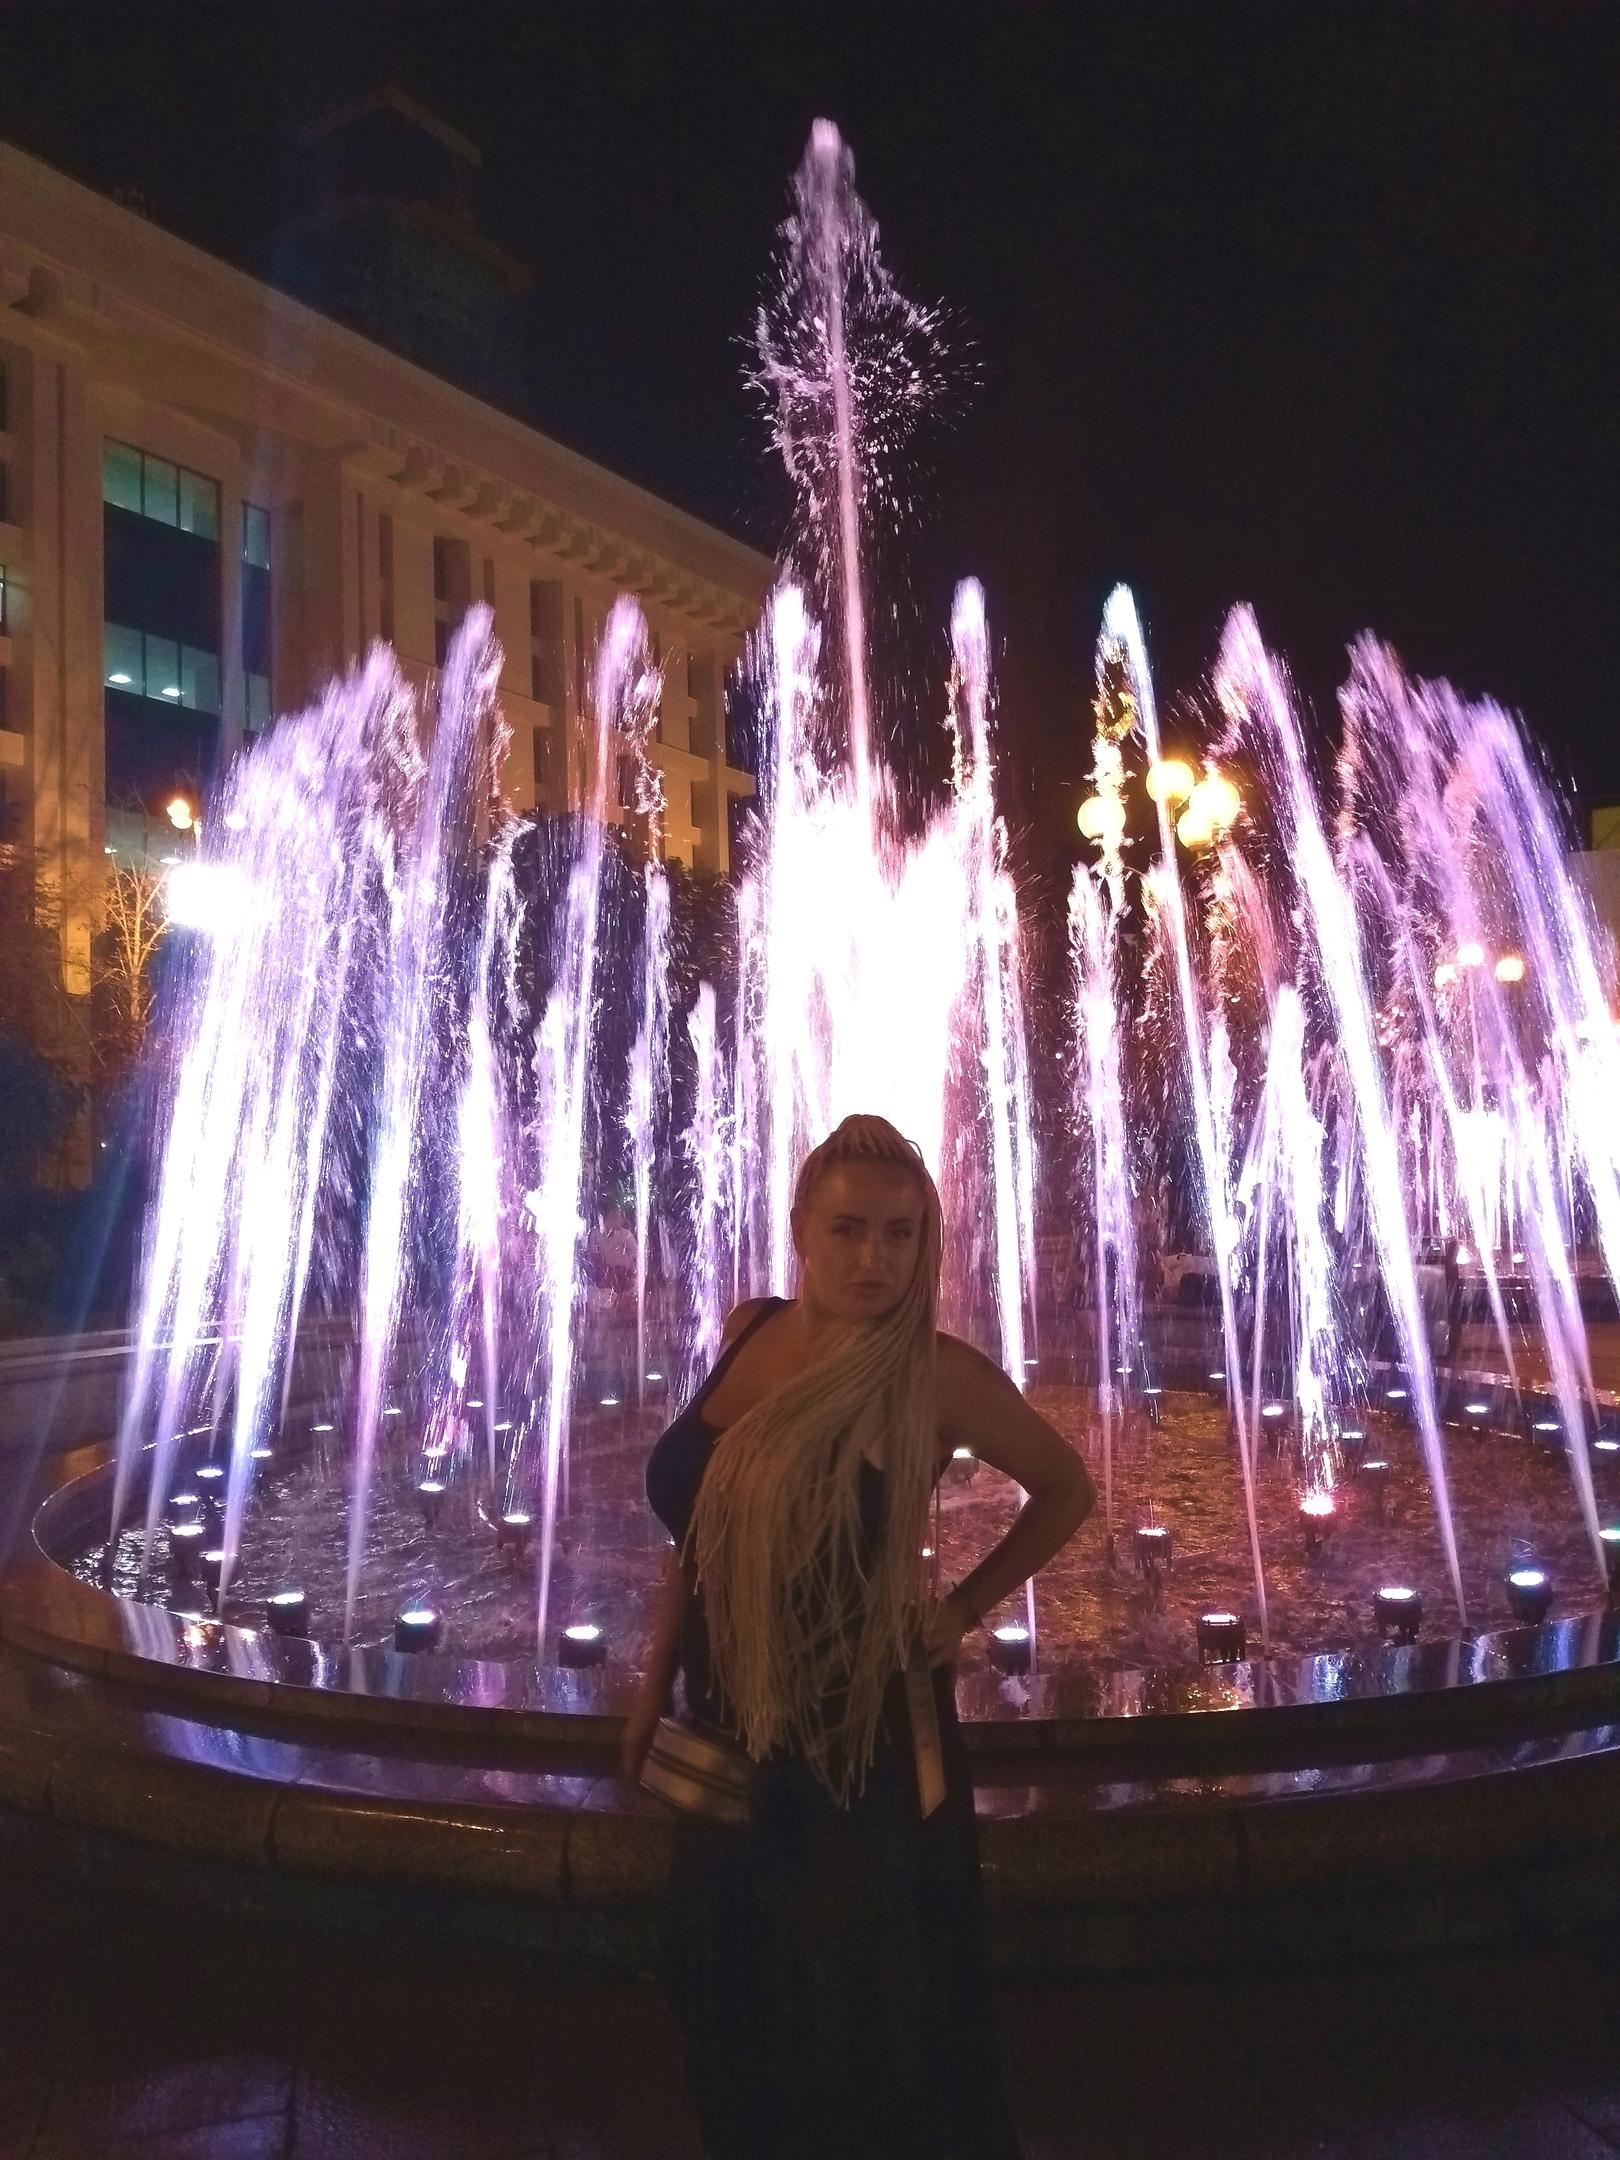 Елена Руденко (Валтея). Украина. Киев. Фото и описание.  - Страница 2 BrMRNp9L7eE